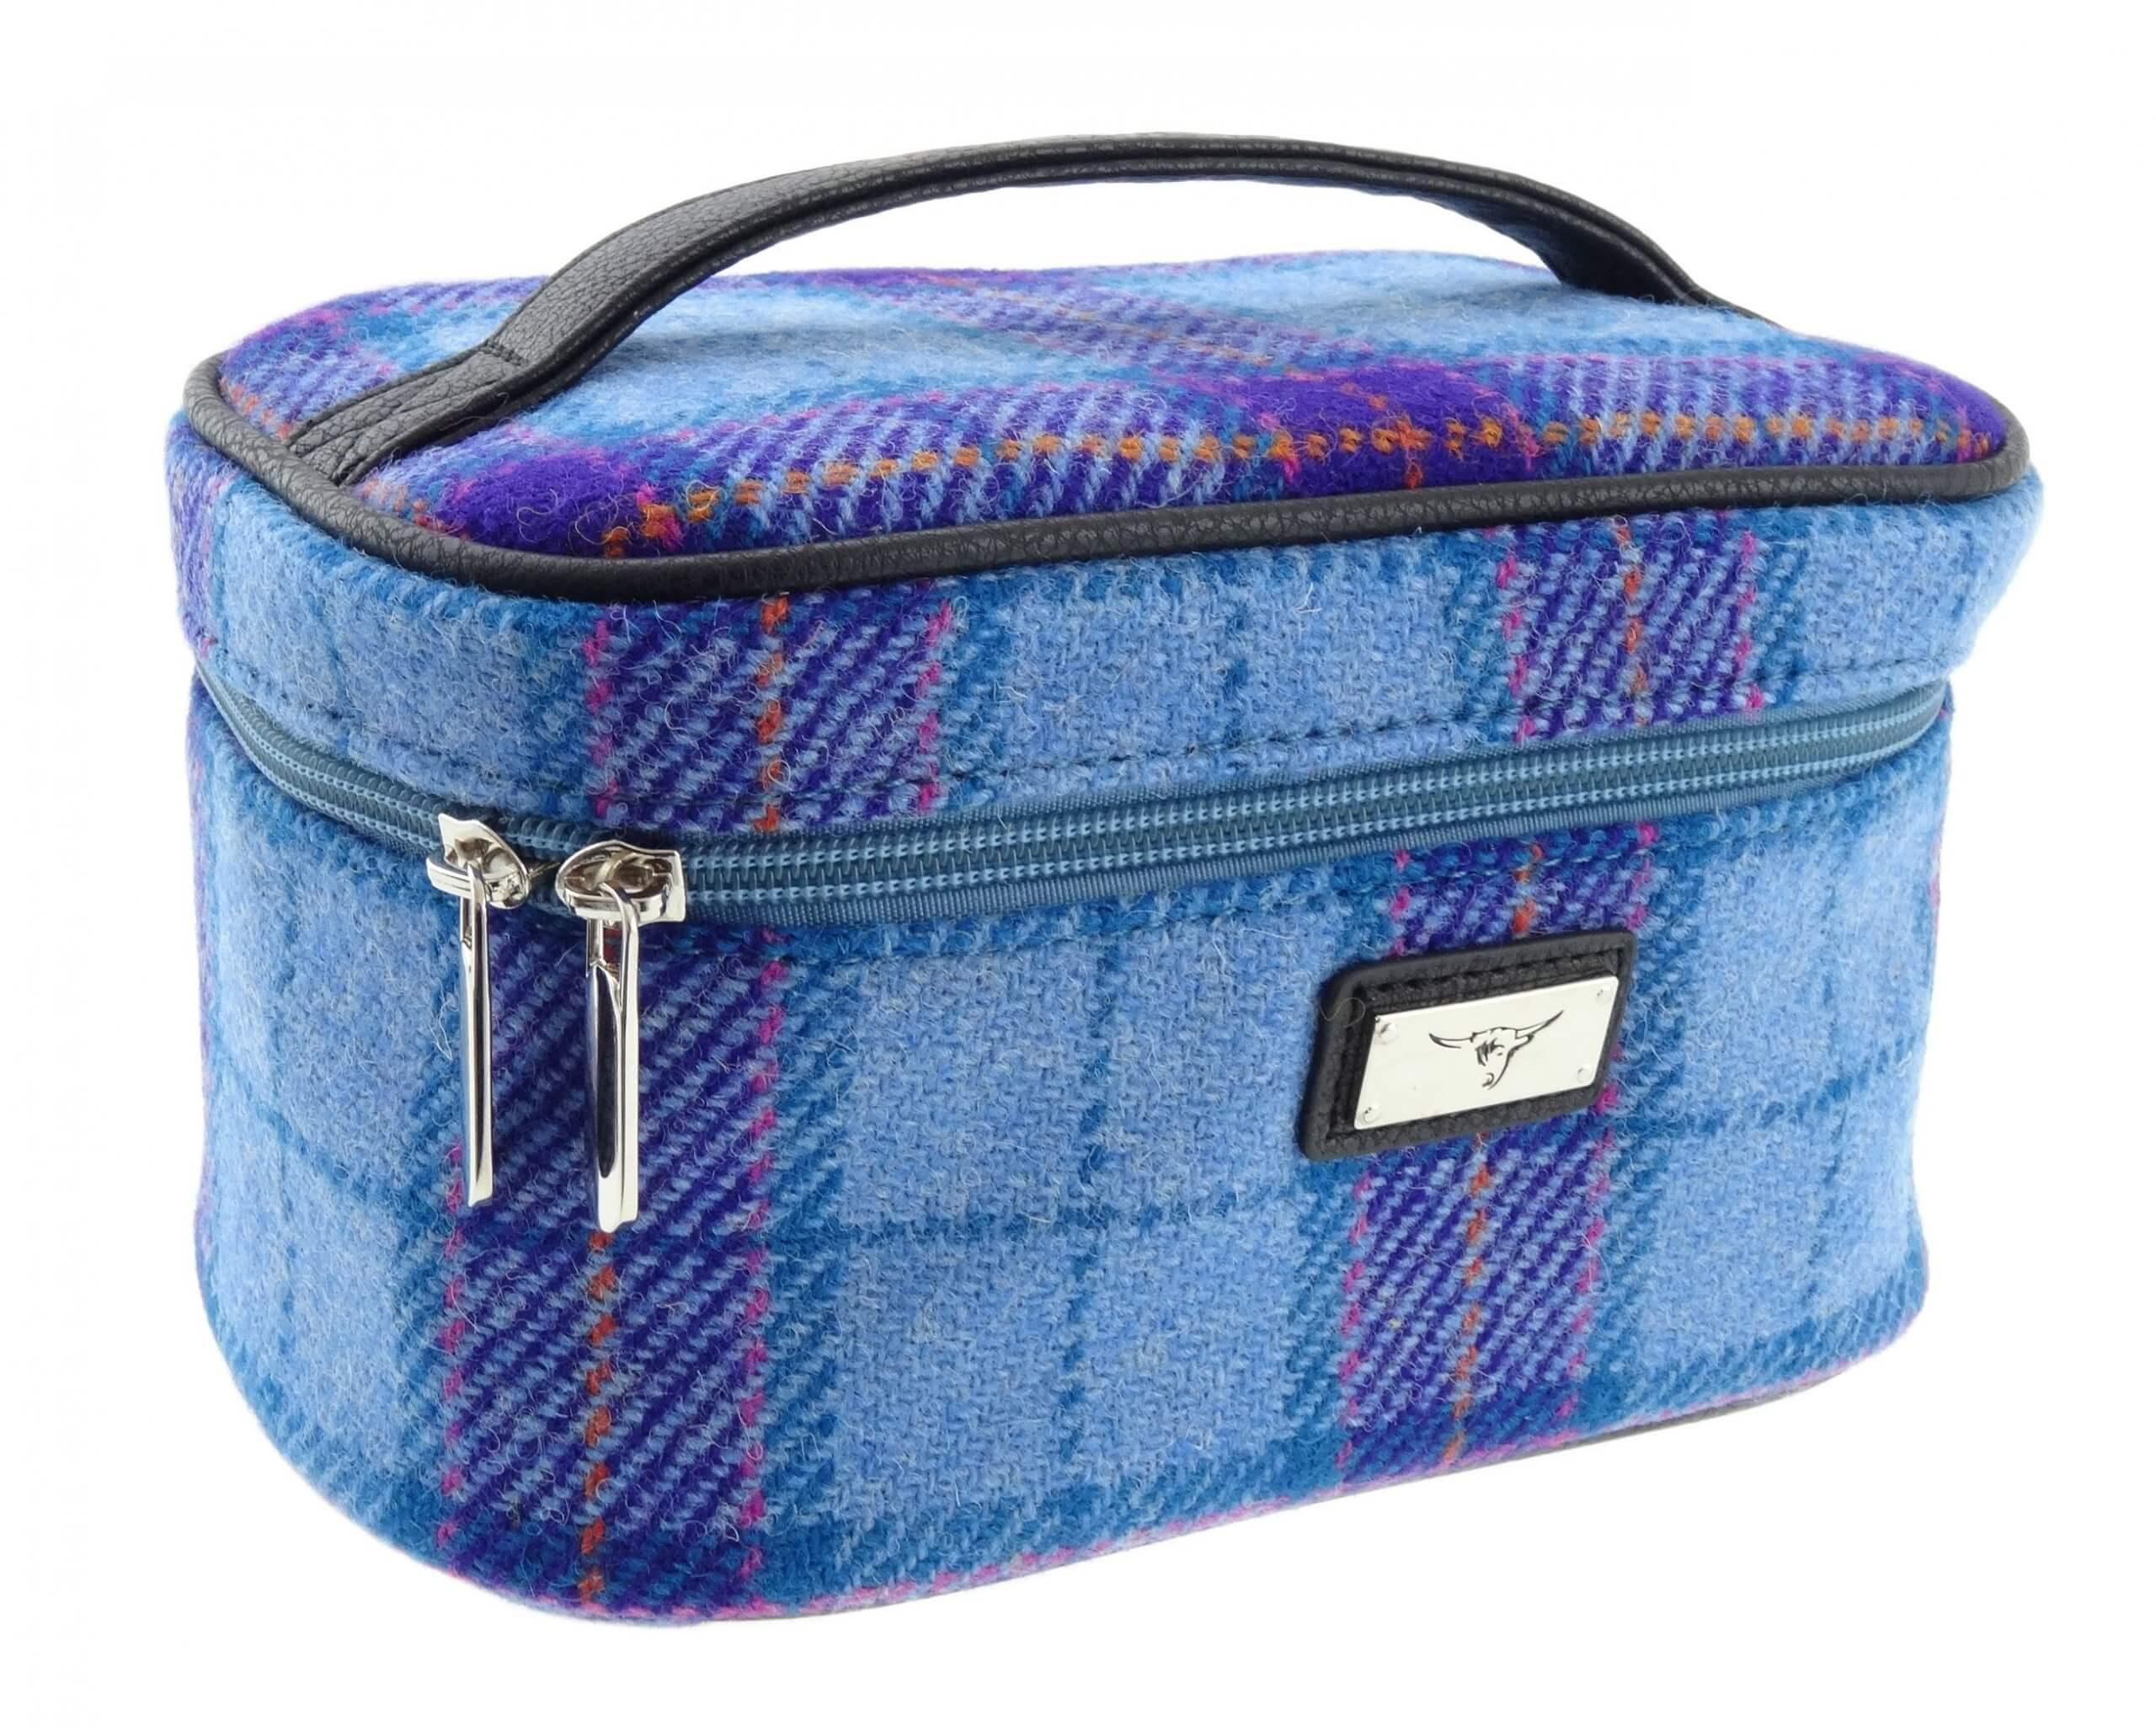 Harris Tweed Cosmetic Bag LB2103-COL35